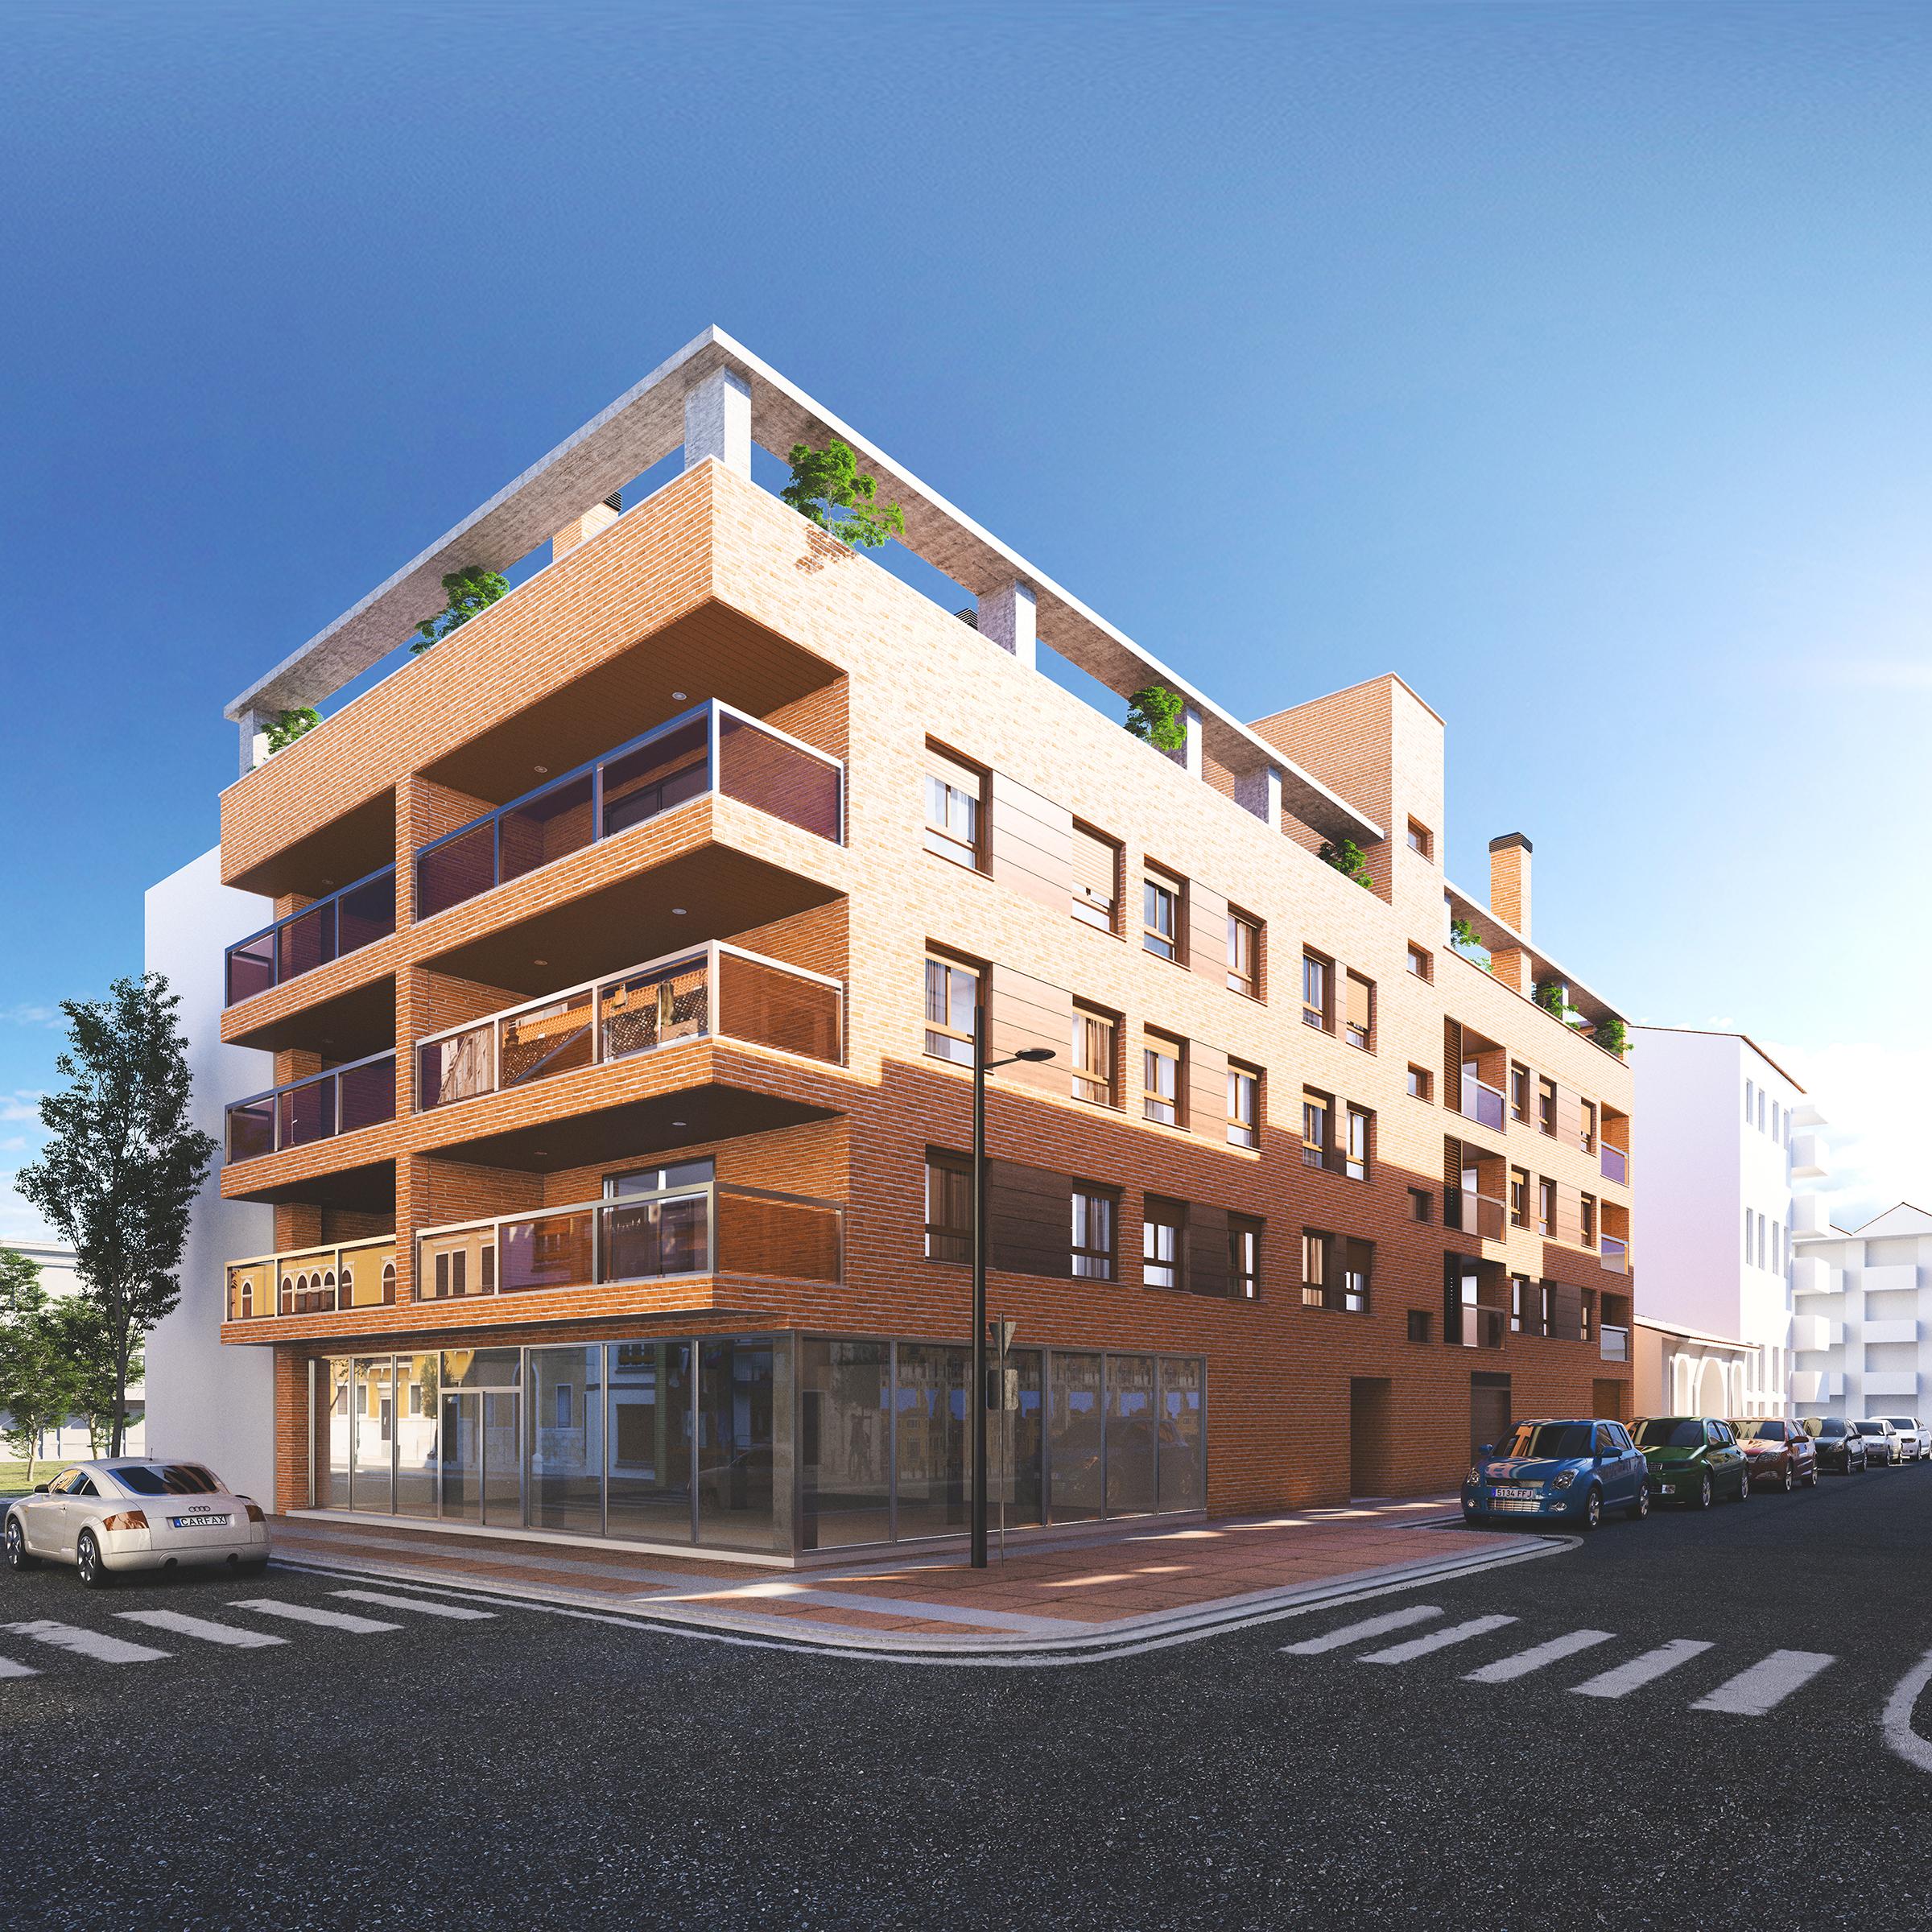 Render exterior view block of flats at Barbastro by GAYARRE infografia